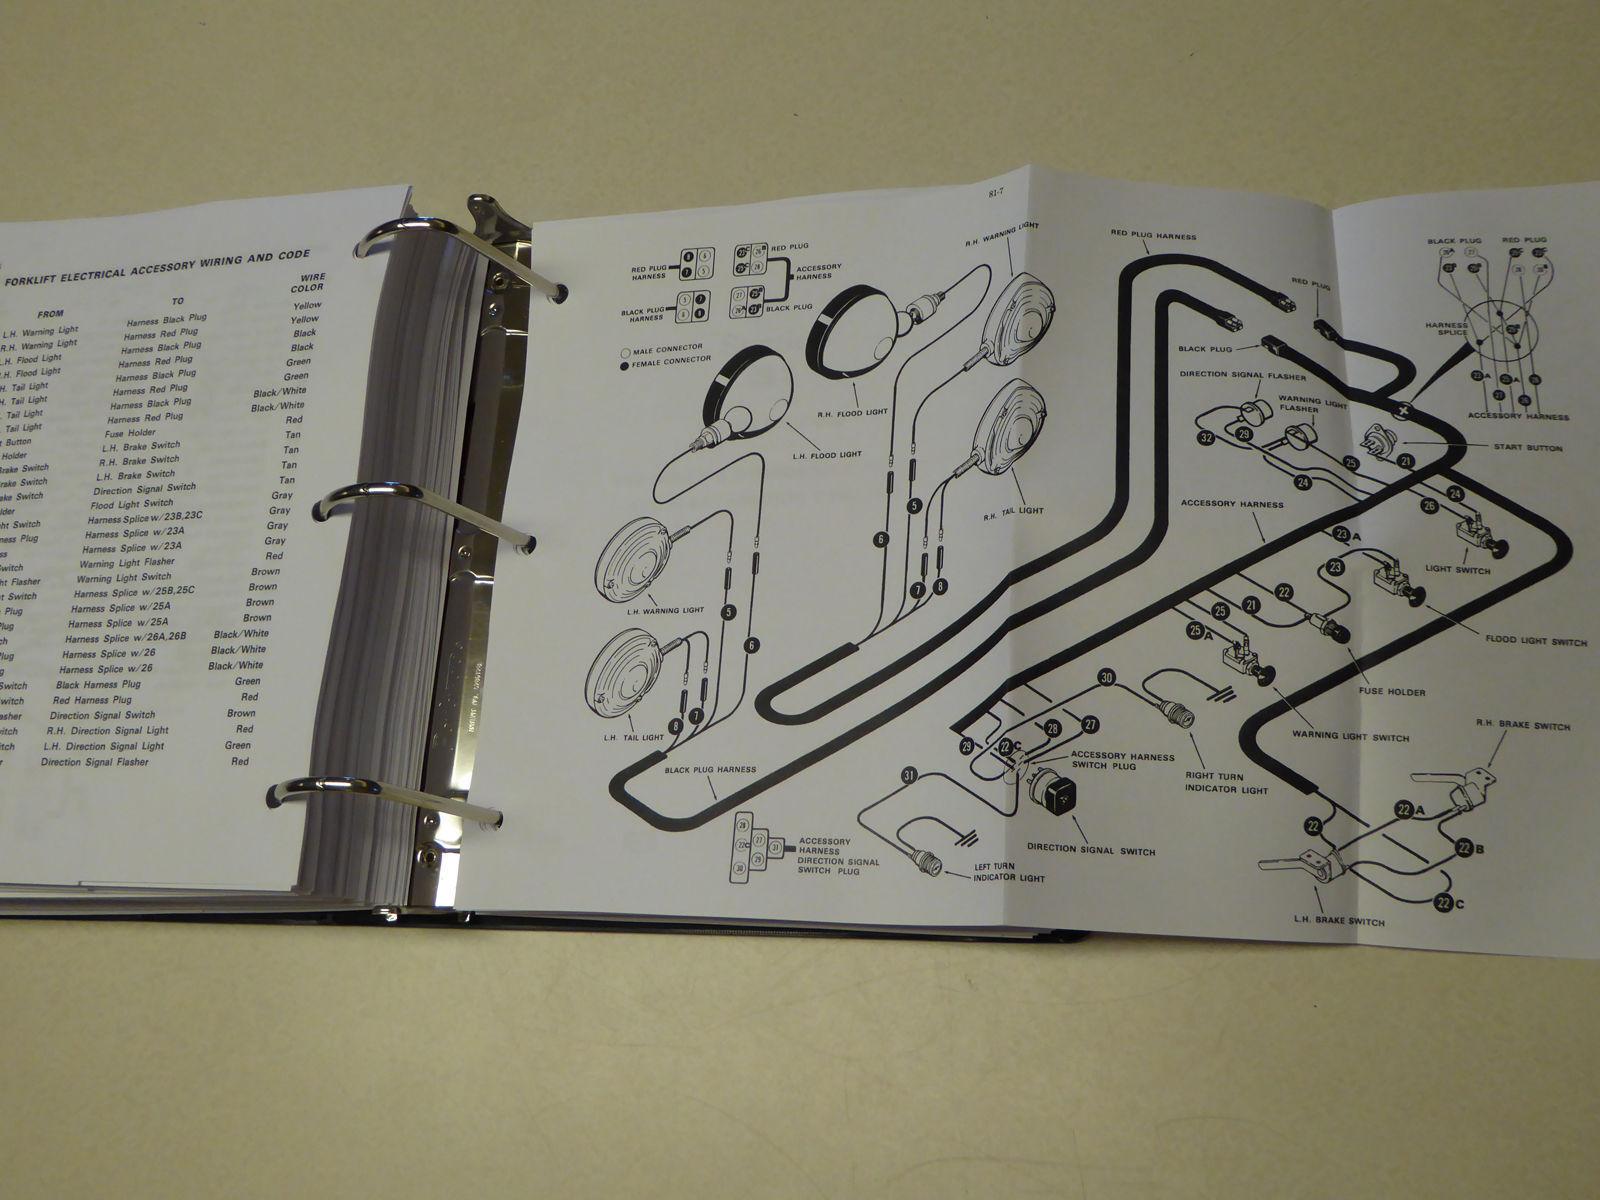 480 B Case Backhoe Wiring Diagram Library 7 Of 12 580b 580ck Loader Forklift Service Manual Repair Shop